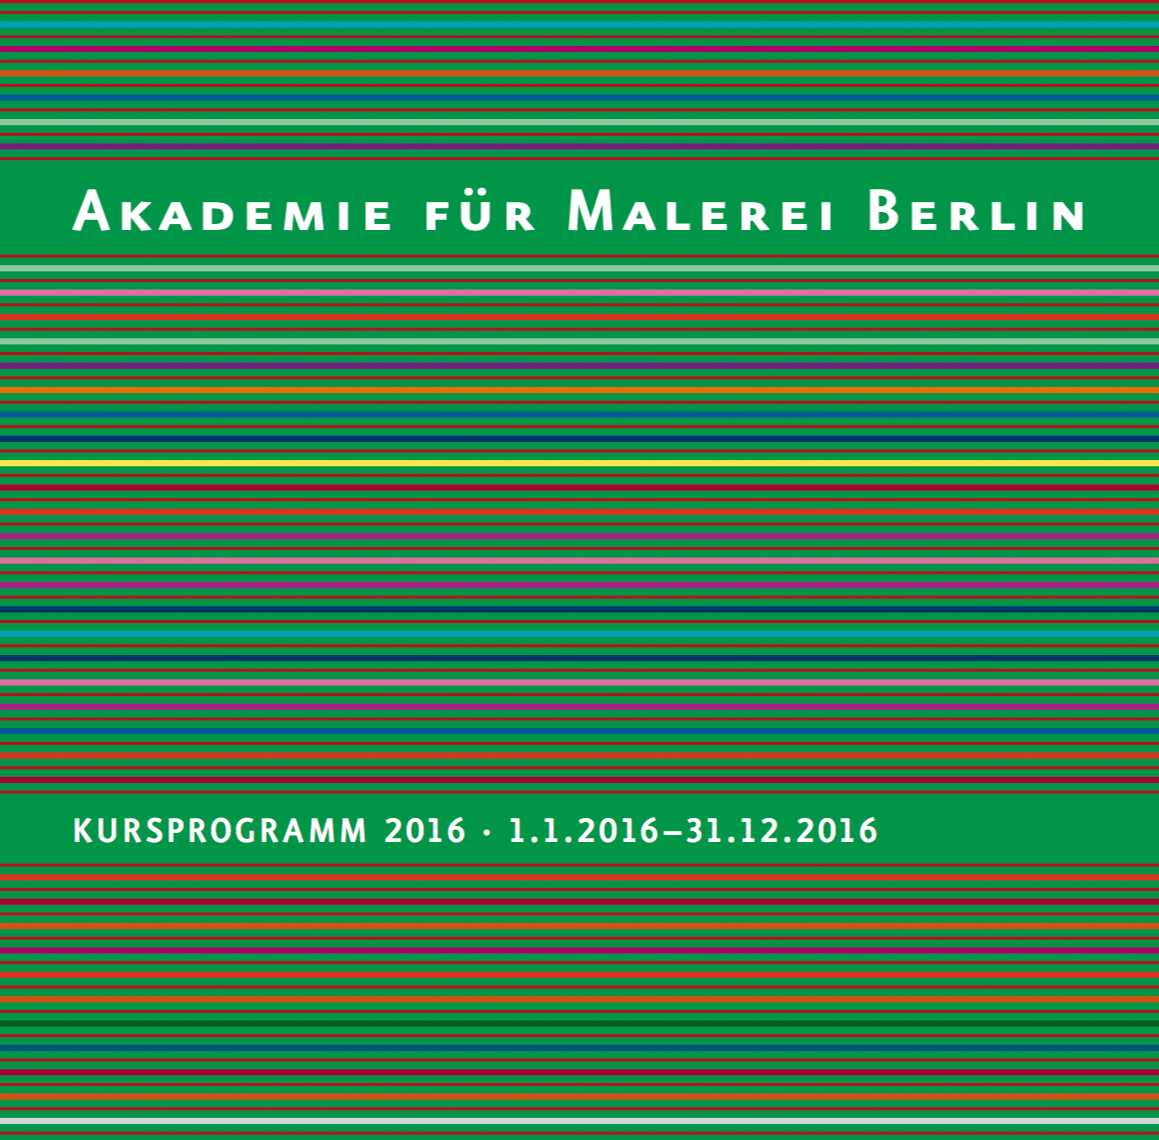 programm 2016 akademie f r malerei berlin. Black Bedroom Furniture Sets. Home Design Ideas